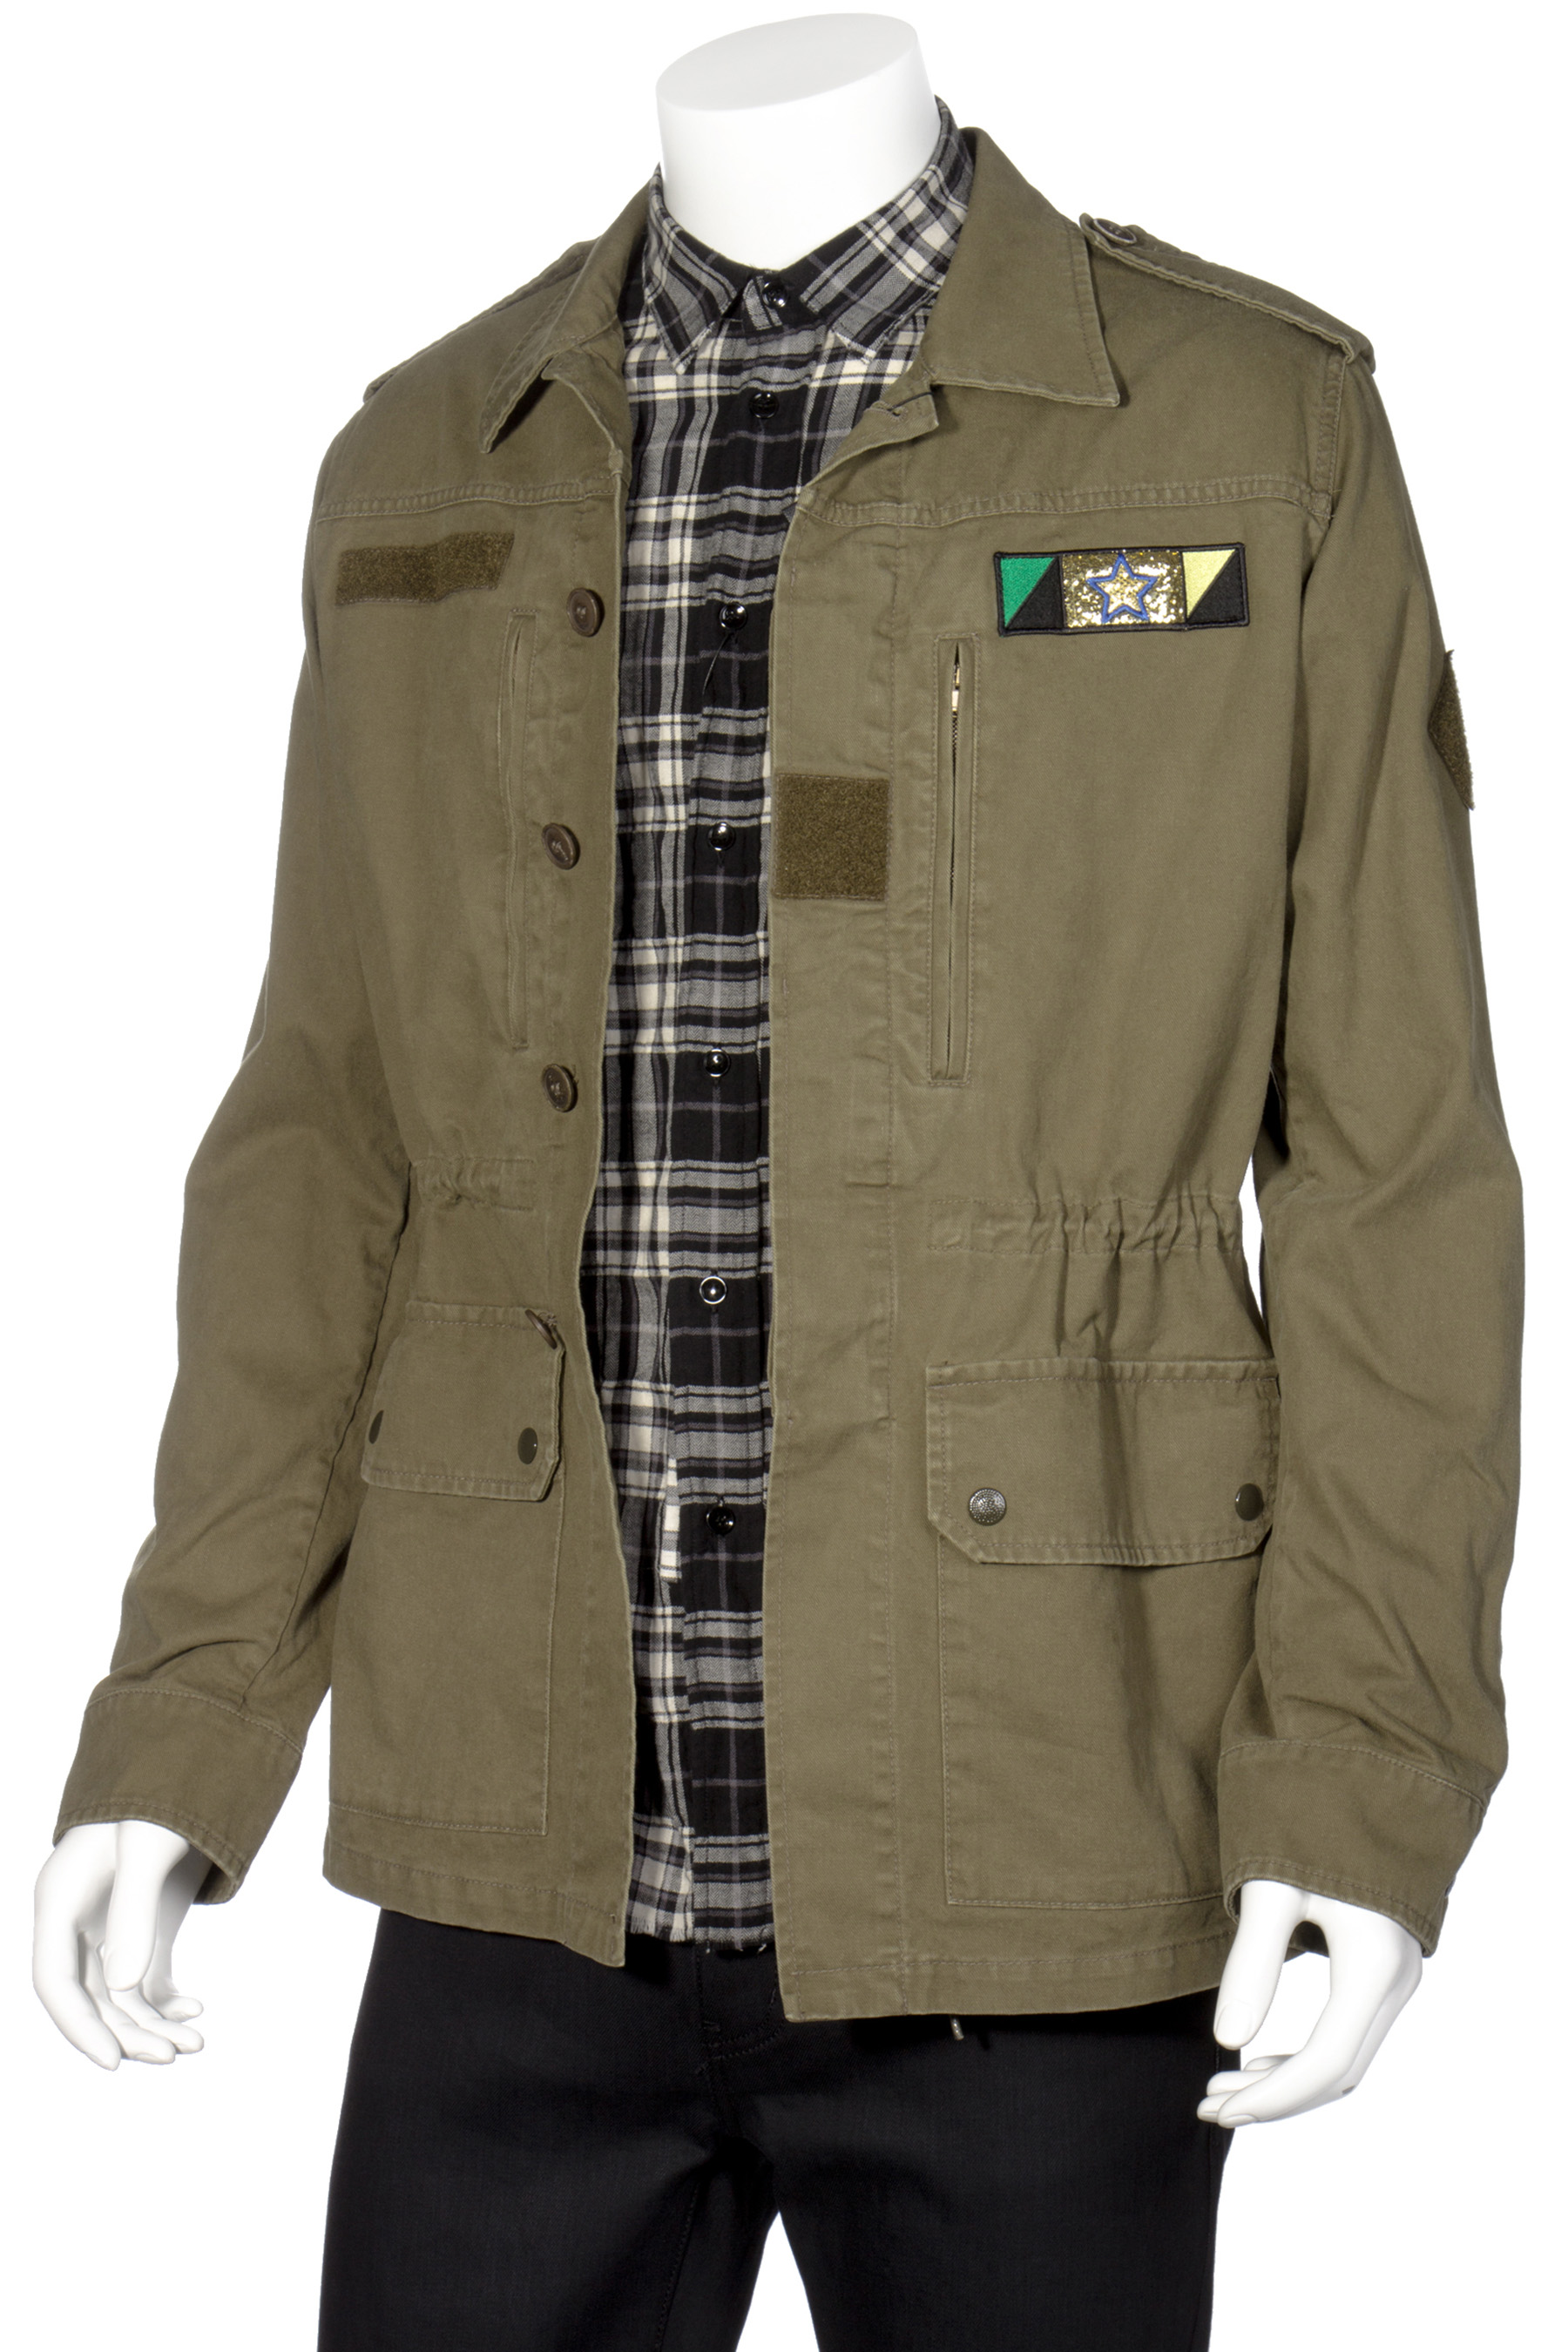 ada20aed49 SAINT LAURENT Military Jacket Sweet Dreams Shark Patch